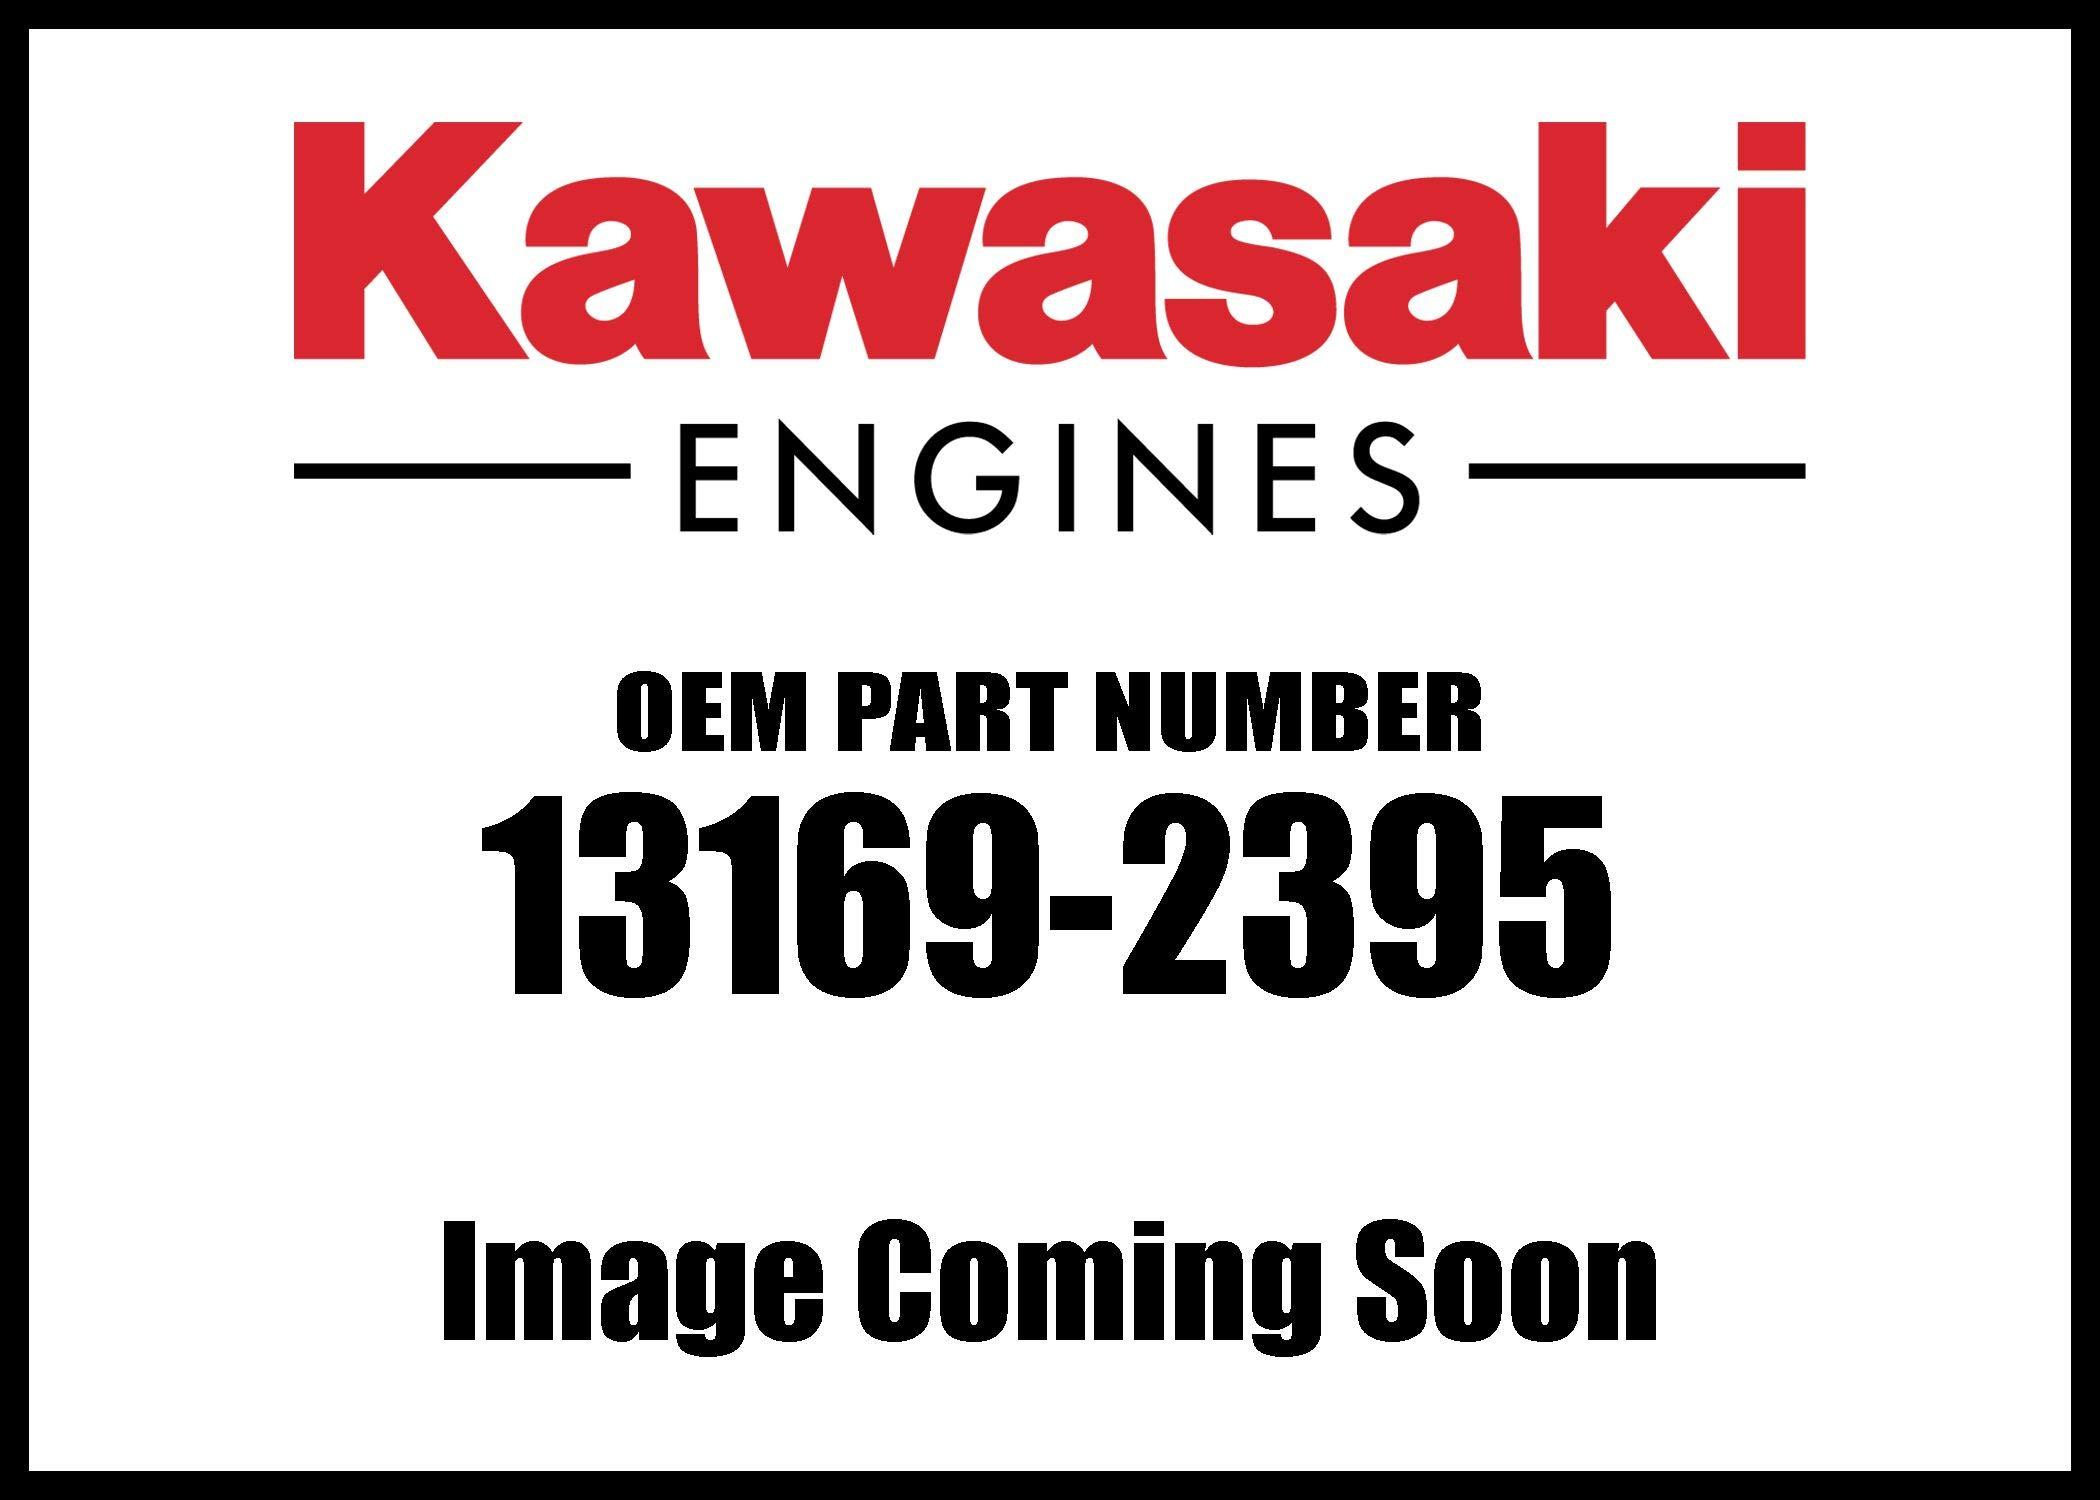 Kawasaki Engine Plate Air Filter 13169-2395 New OEM